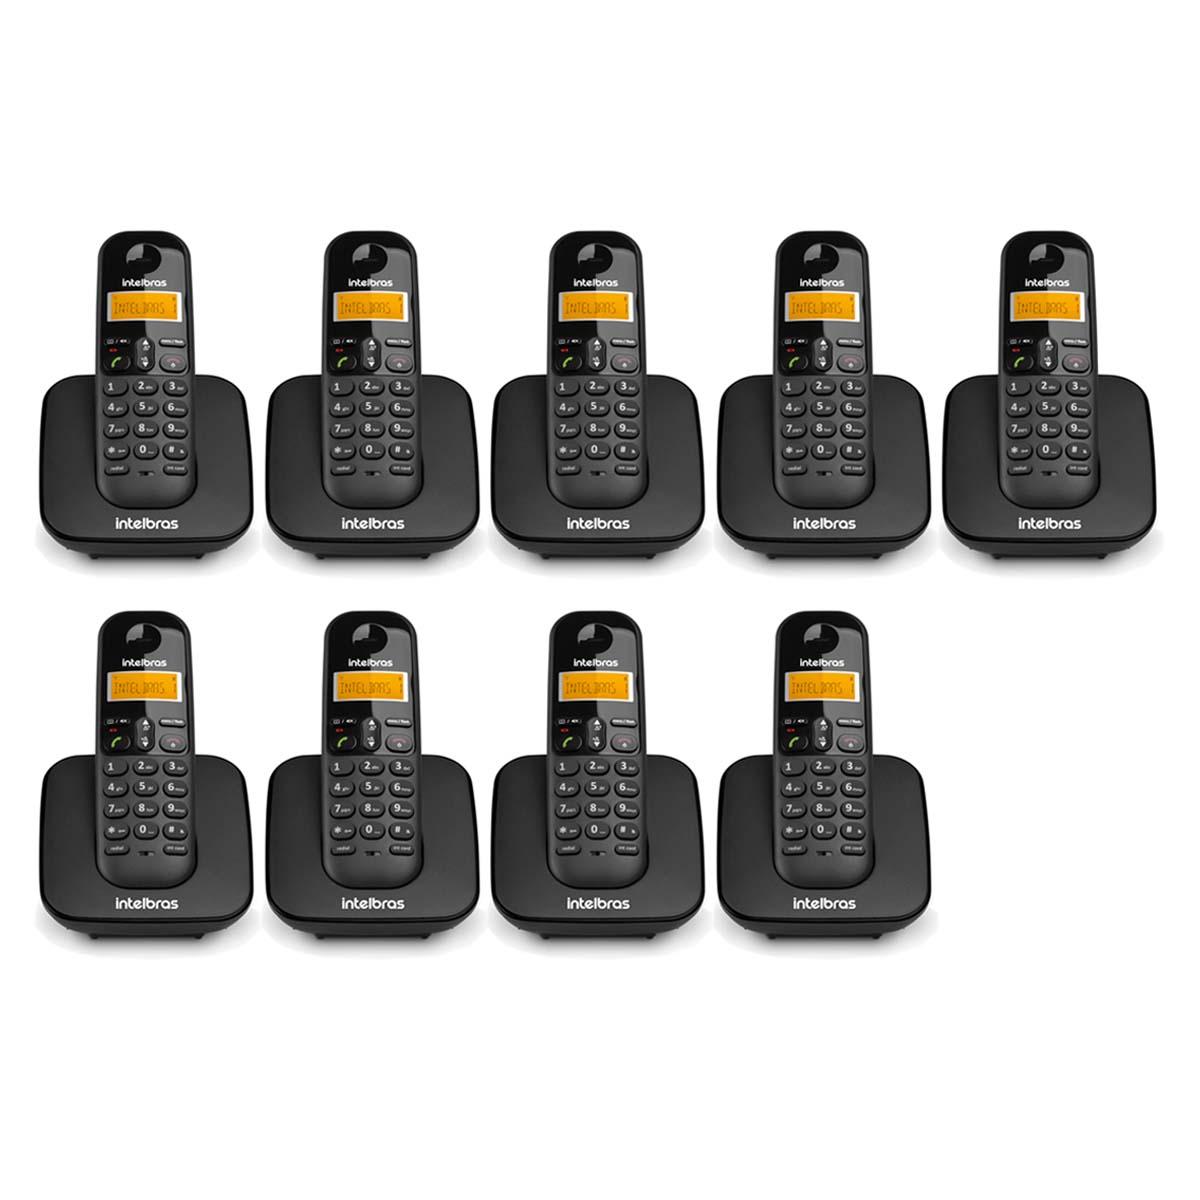 Kit 09 Telefone Sem Fio Intelbras Ts 3110 Preto